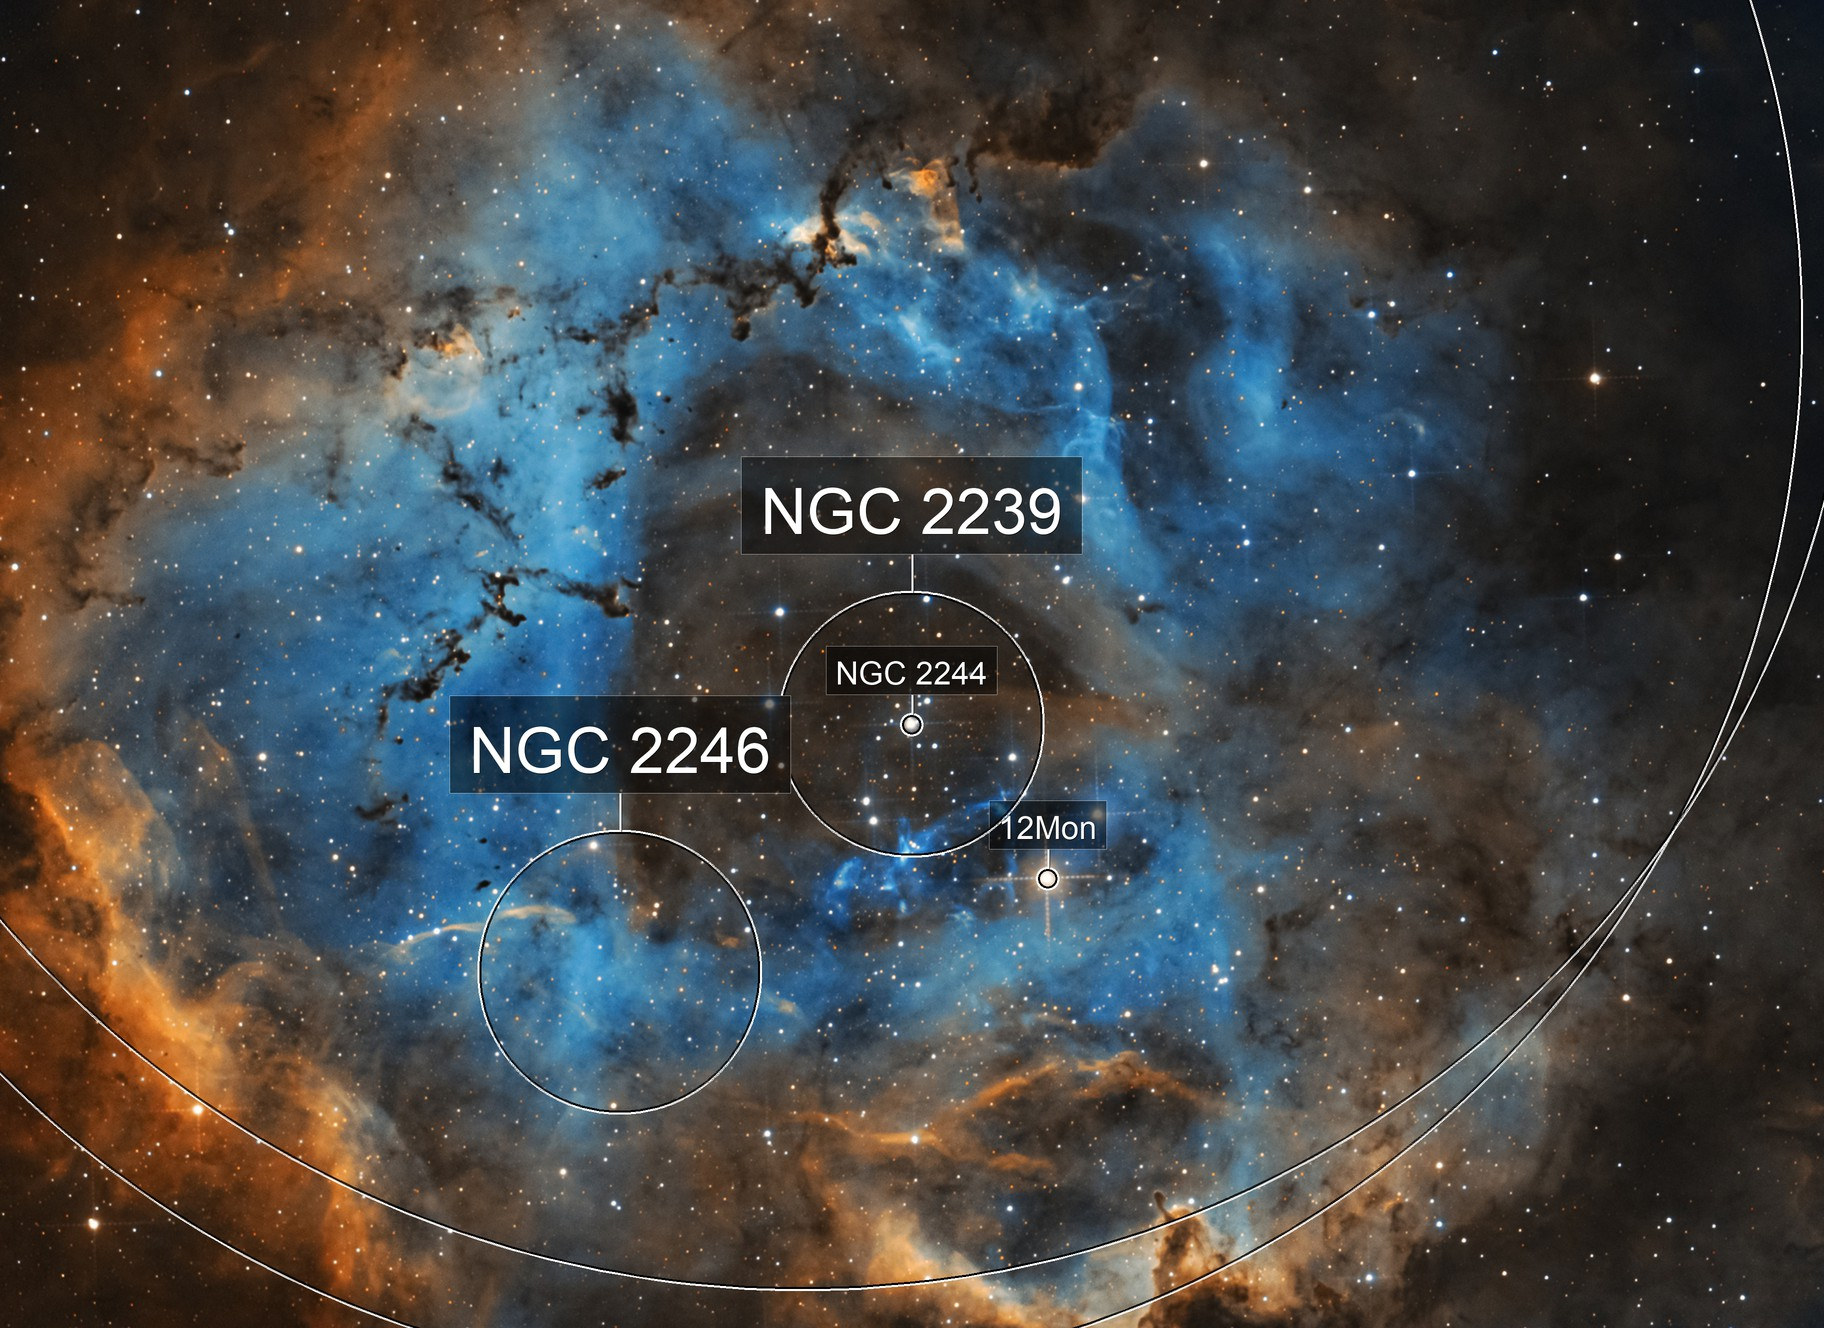 NGC 2237 Rosette Nebula SHO Hubble